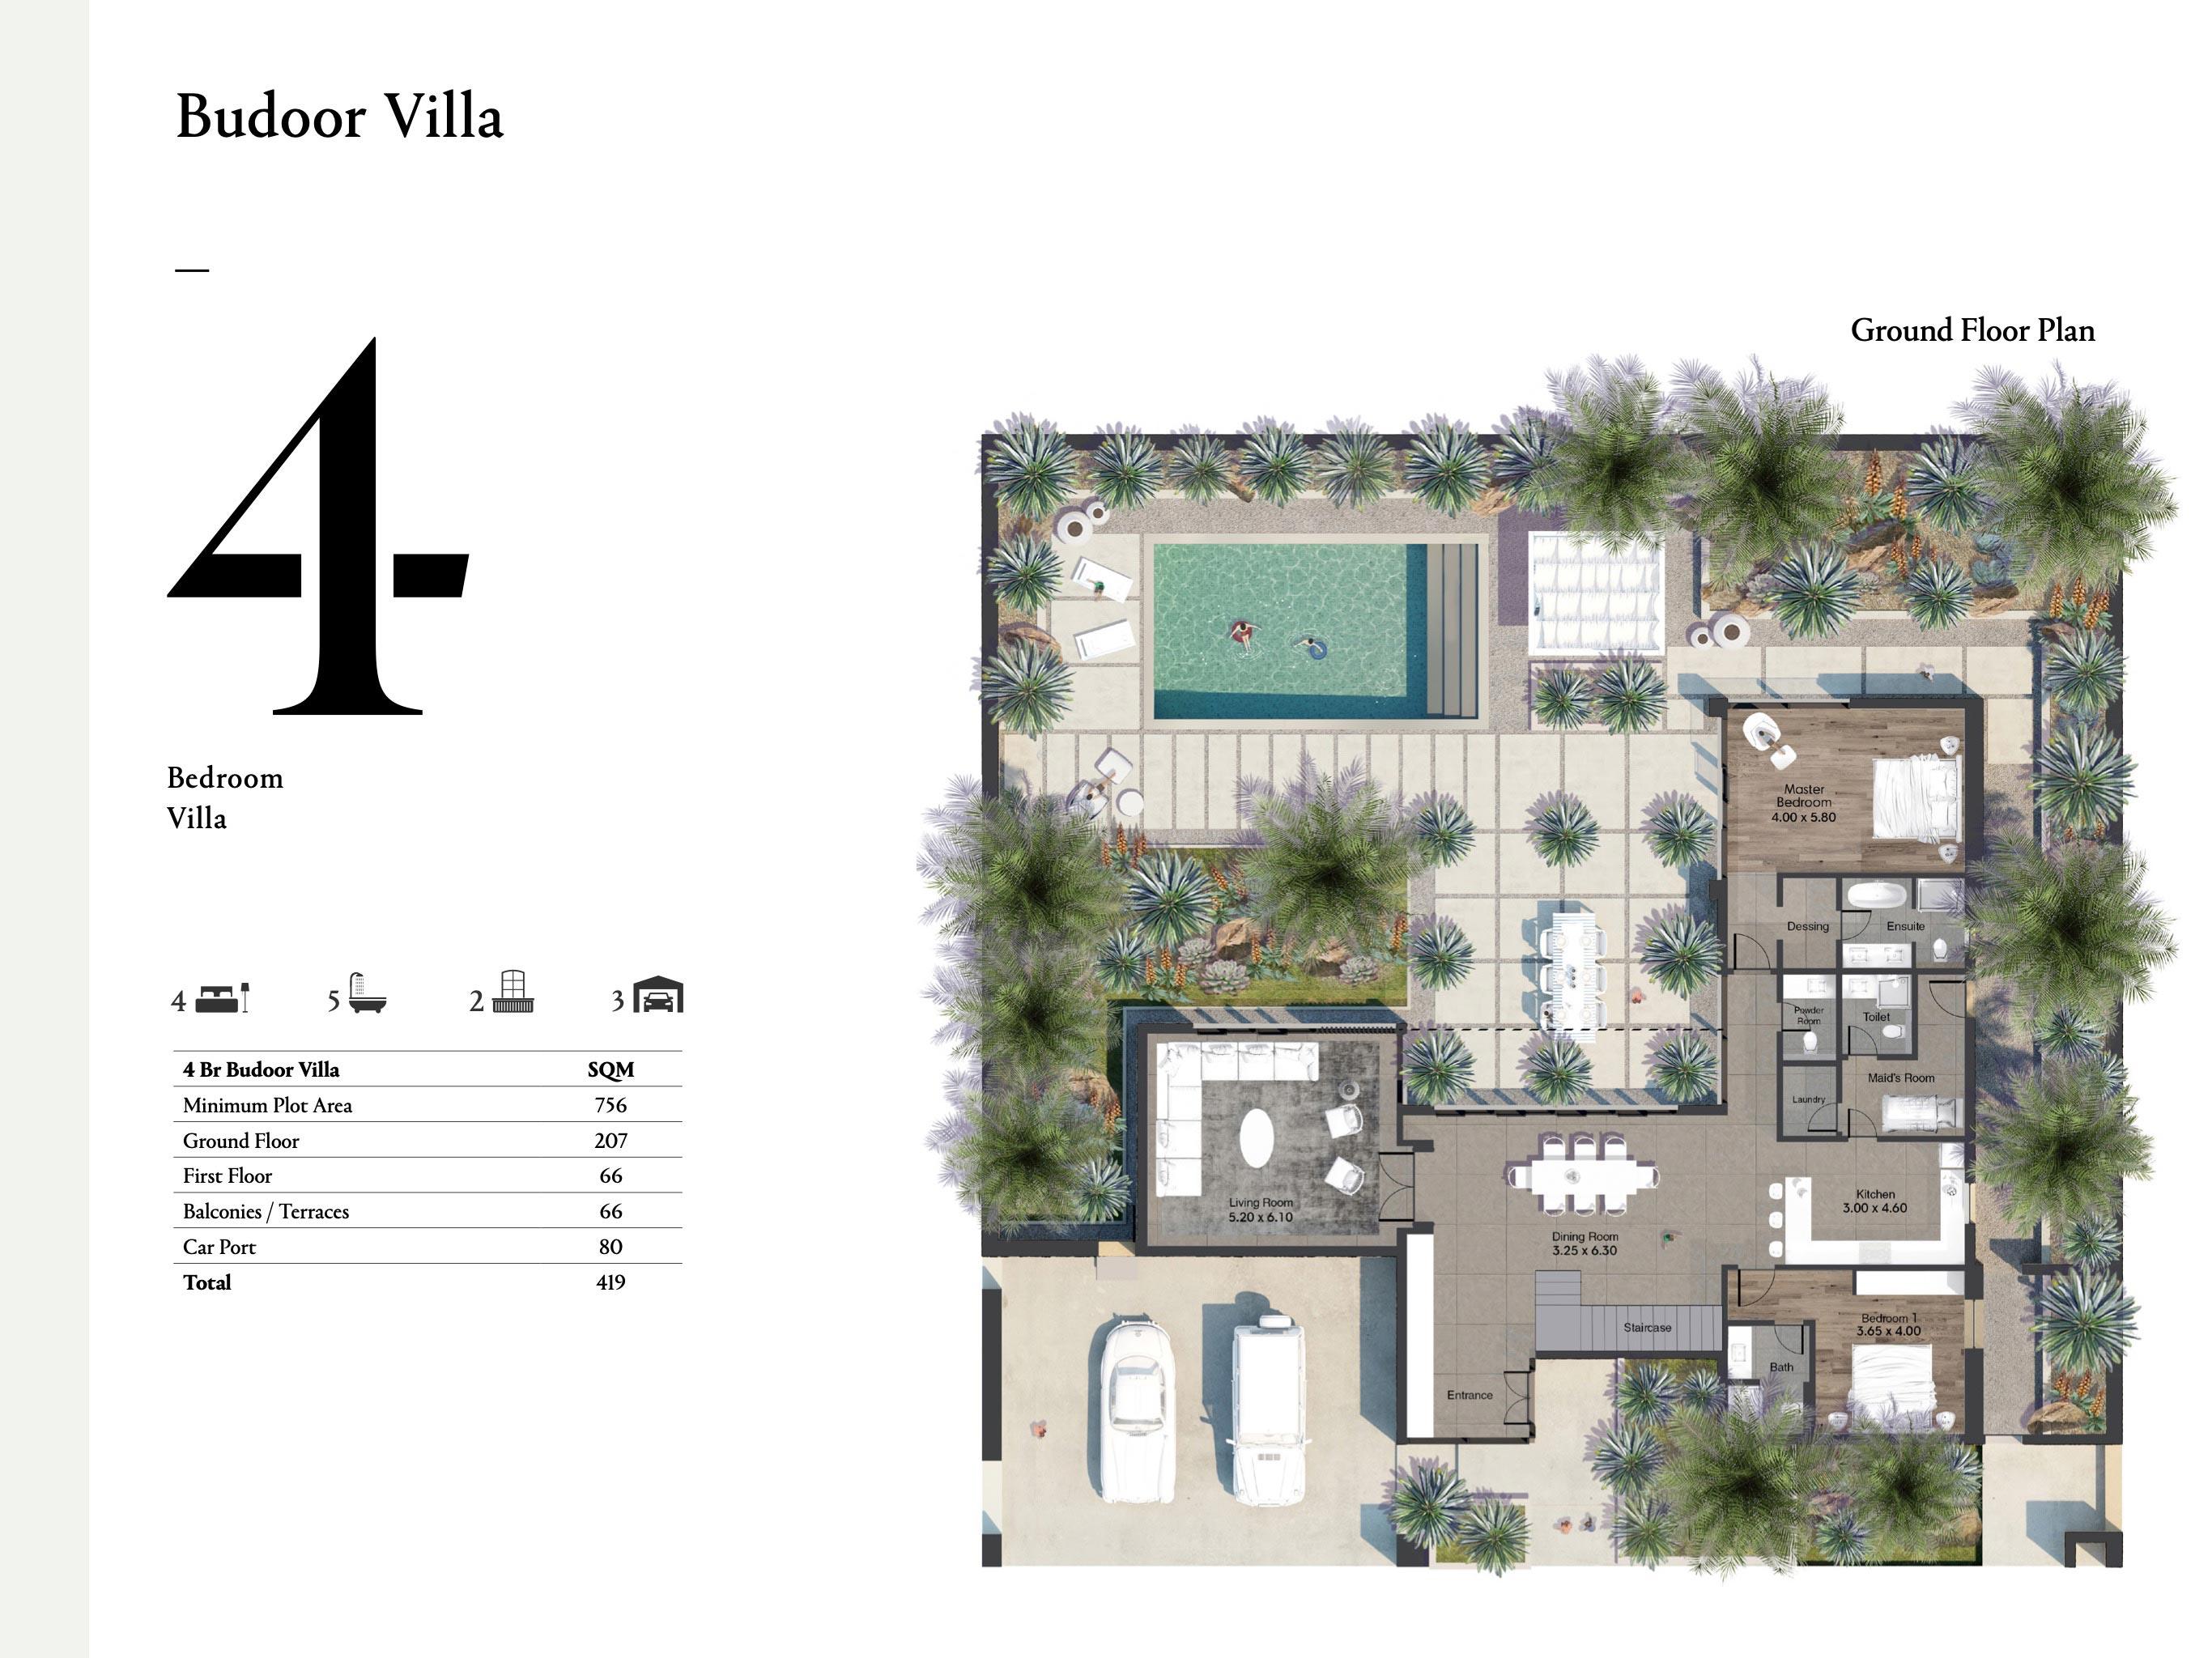 فيلا بدور - 4 غرف نوم بمساحة 419 متر مربع